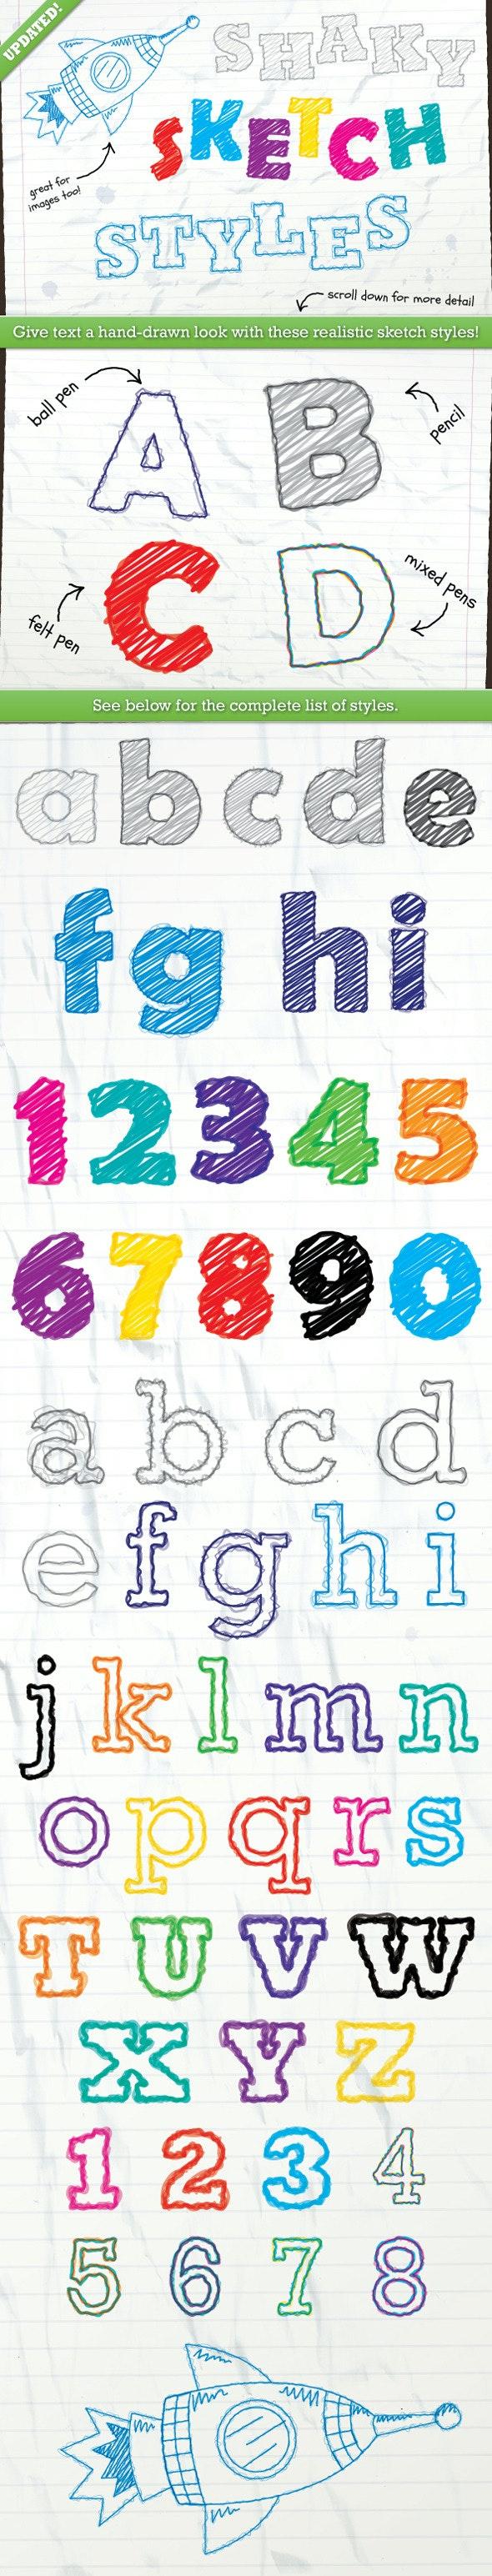 Shaky Sketch Text Styles - Styles Illustrator